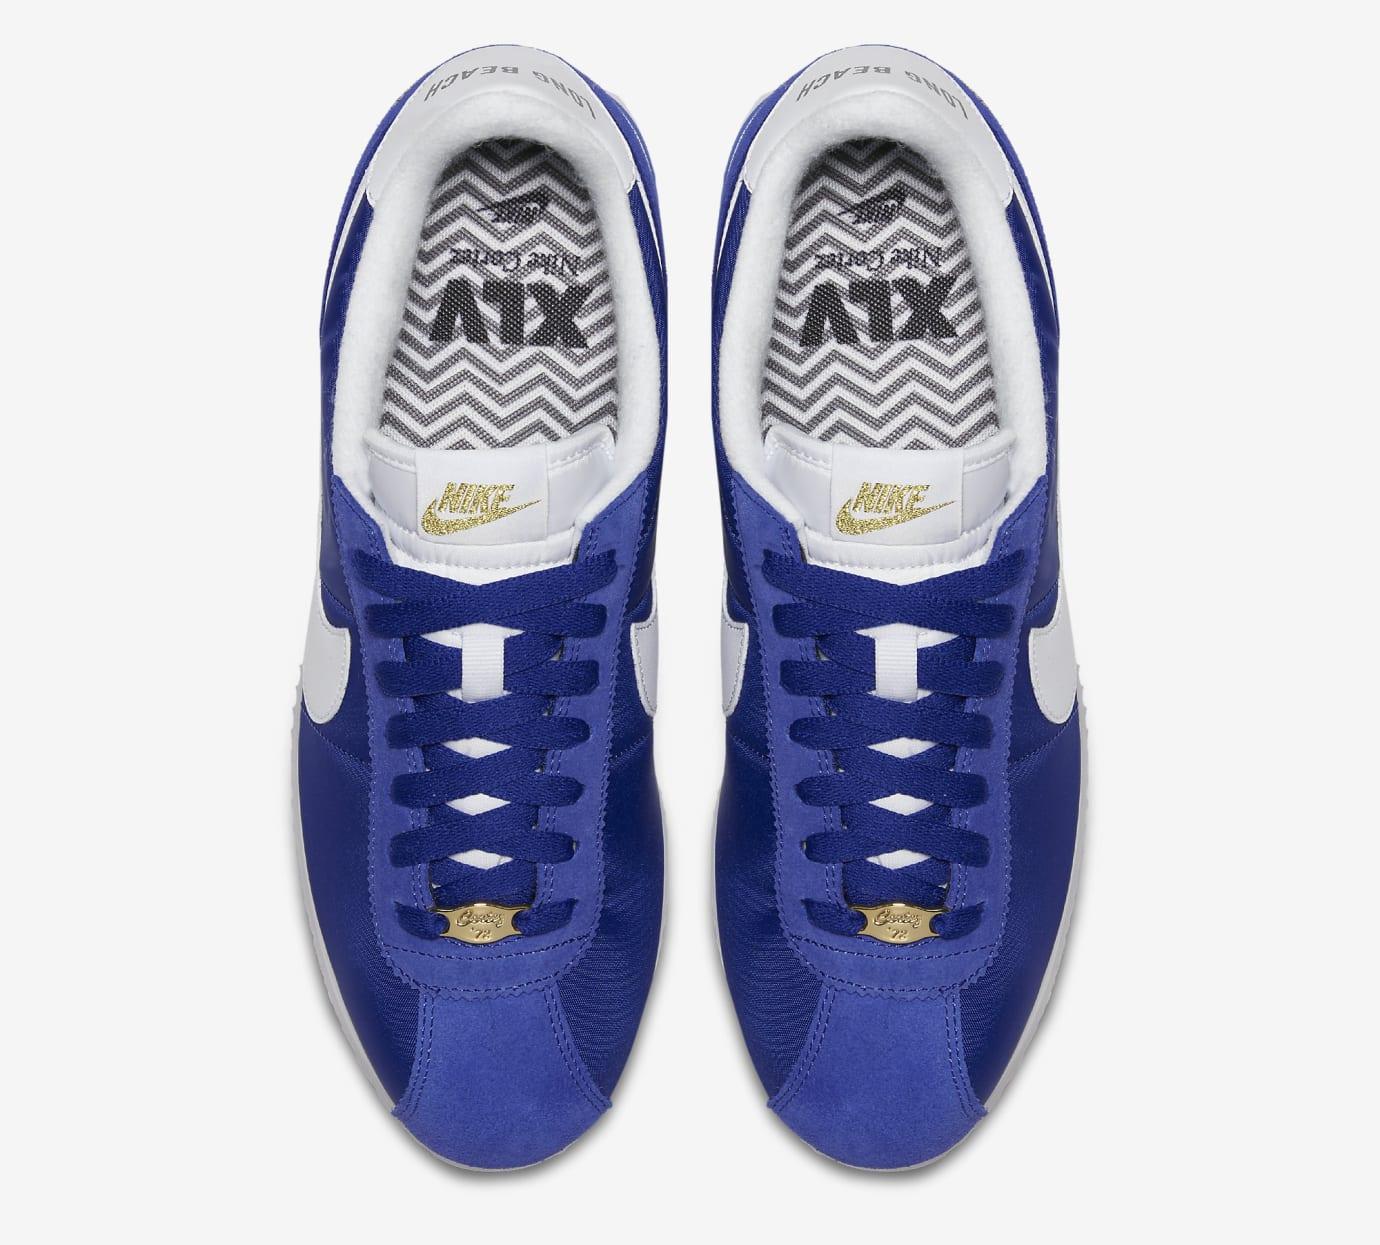 Nike Cortez Long Beach 902804-400 Top